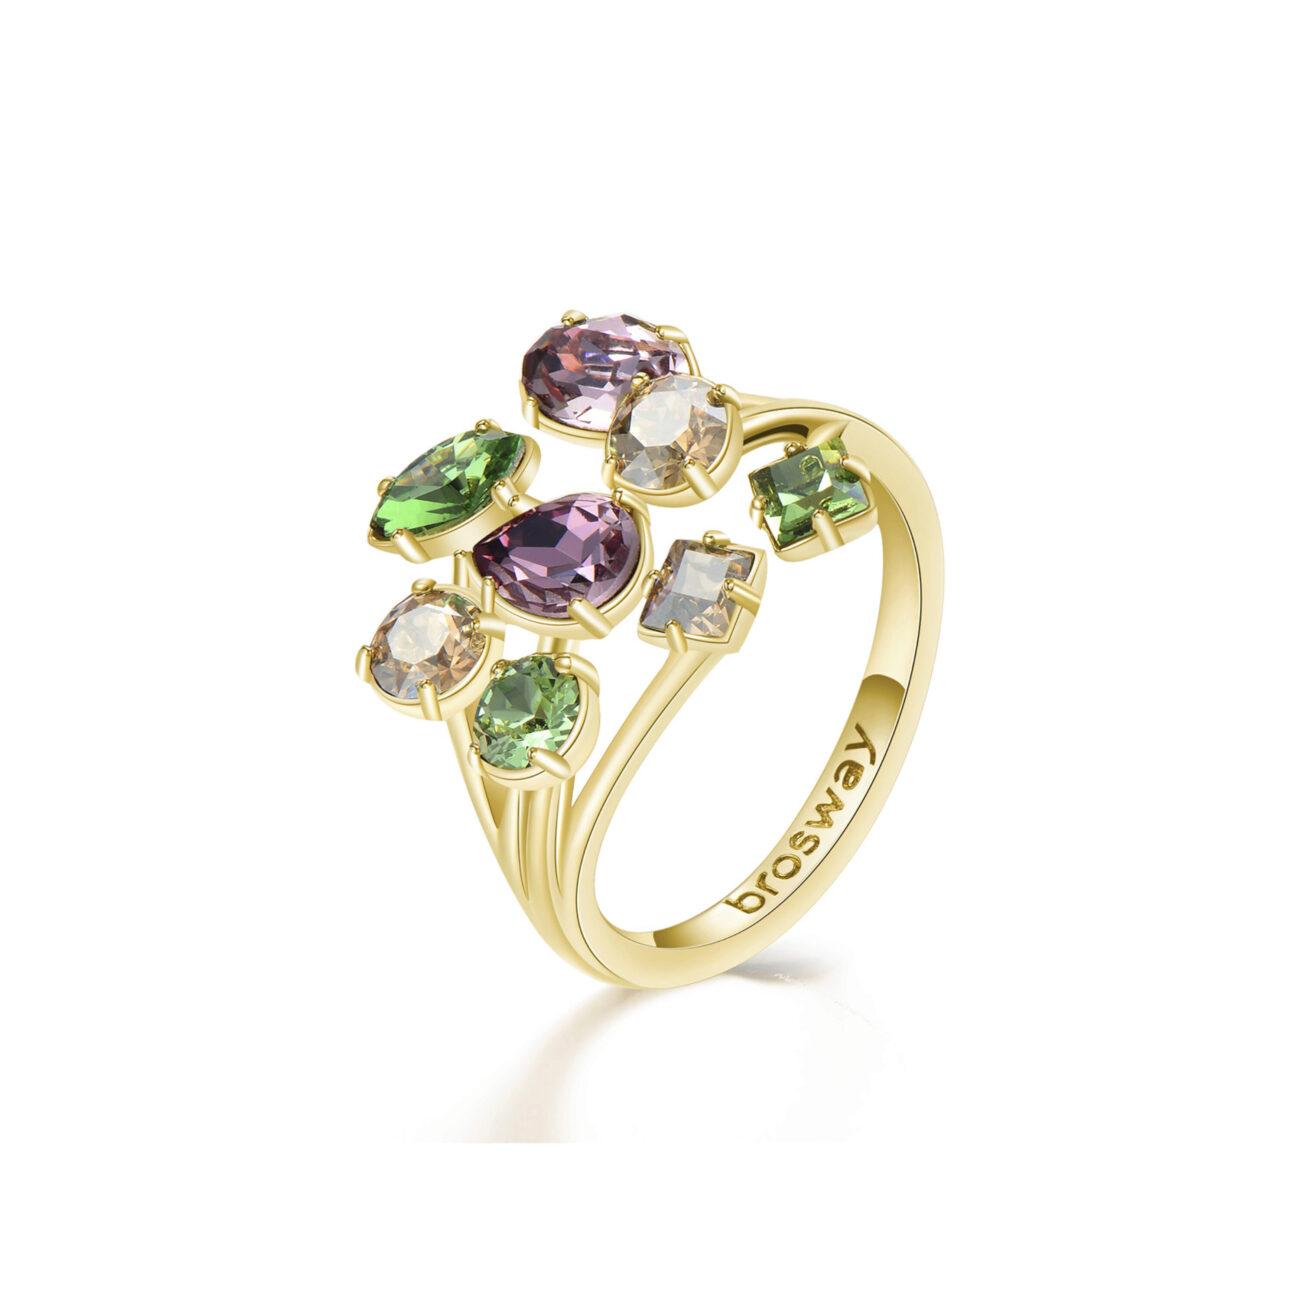 316L rhodiated brass ring, gold galvanic and Swarovski©crystals.